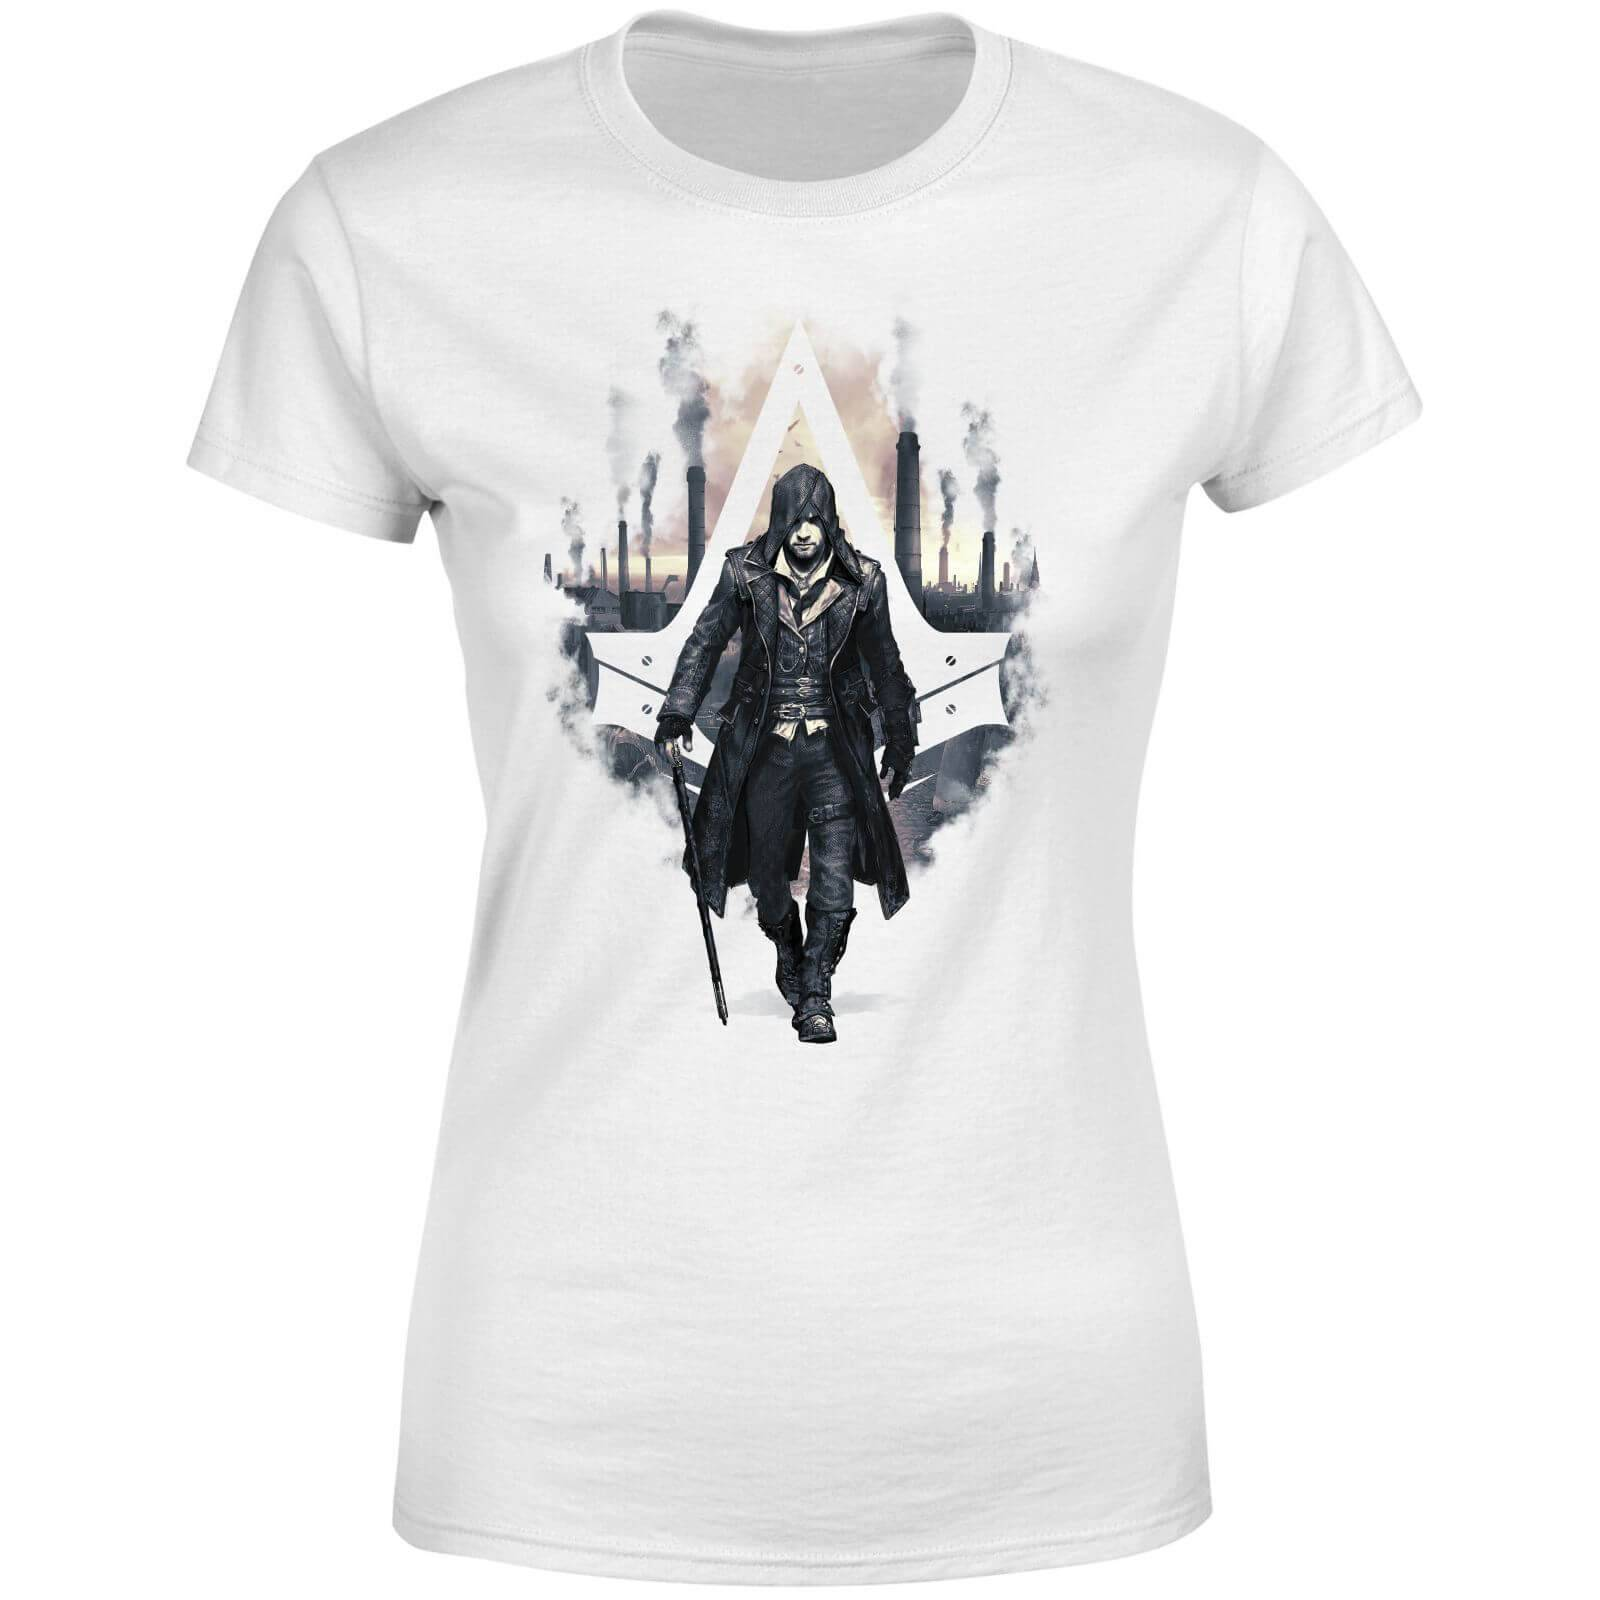 Assassin's Creed T-Shirt Femme London Skyline Assassin's Creed Syndicate - Blanc - XXL - Blanc